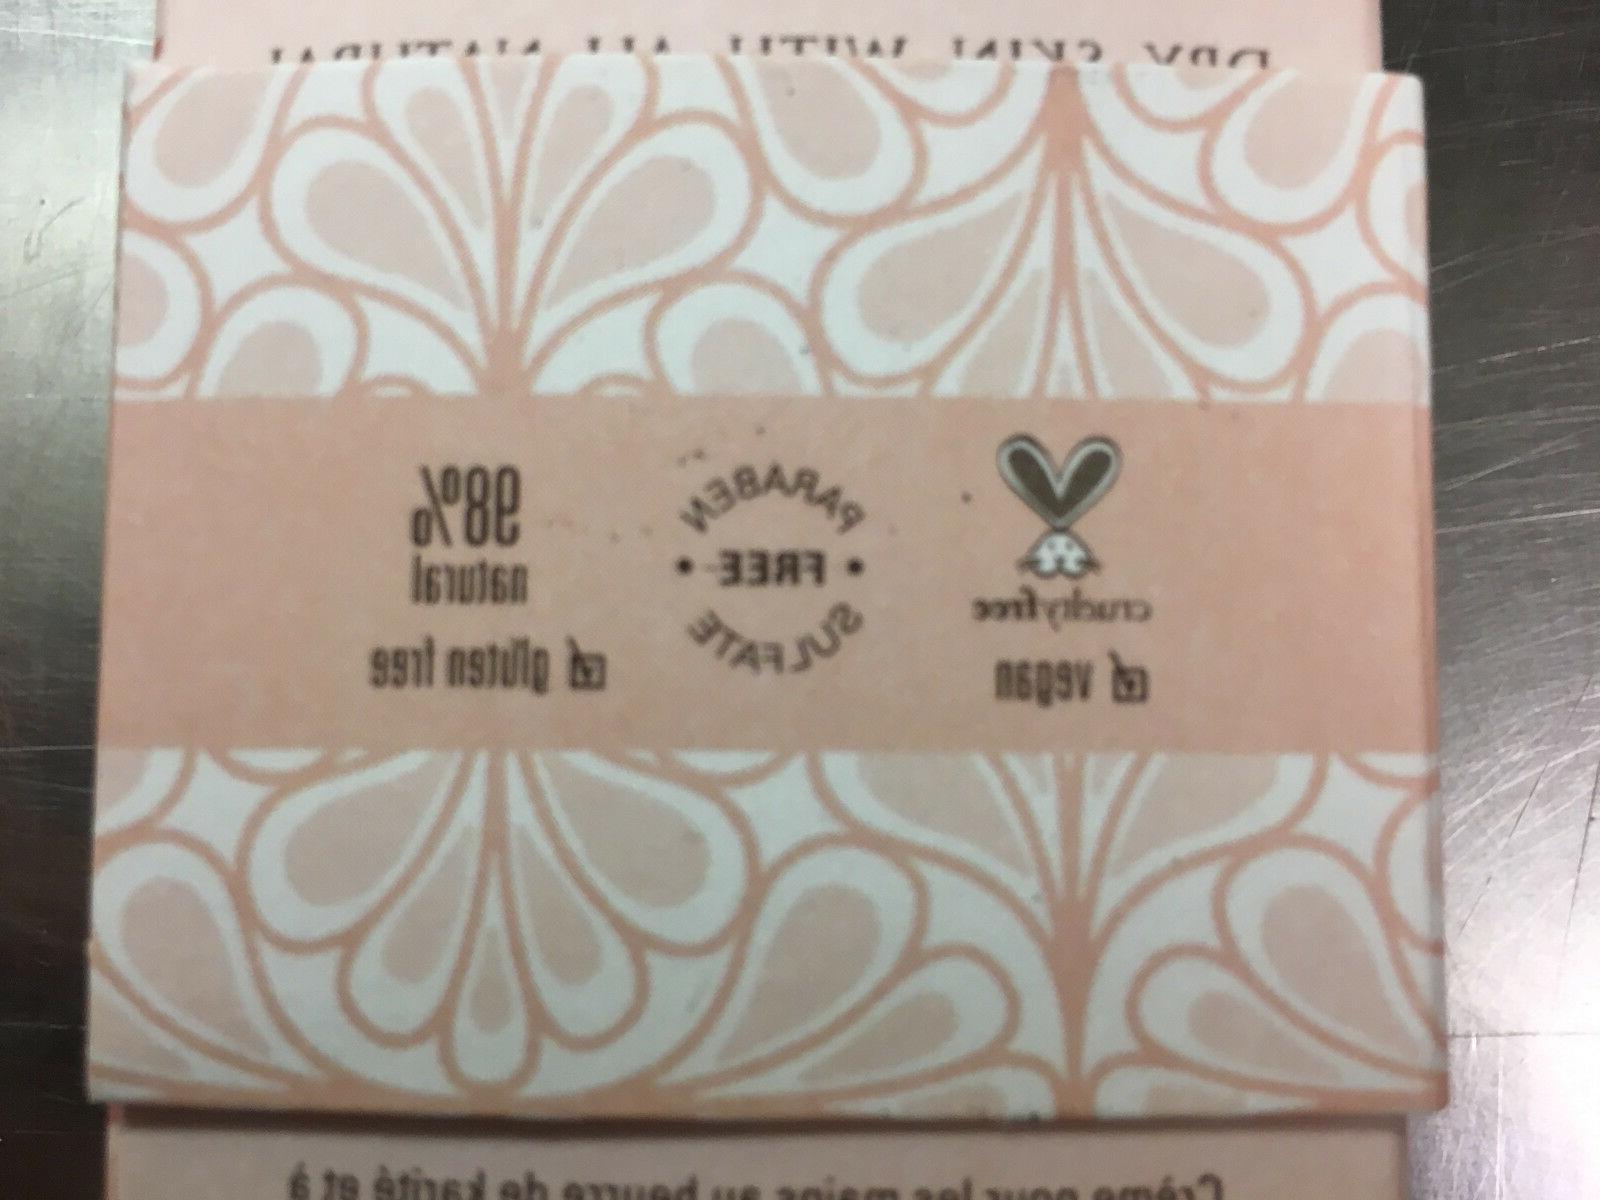 2.4oz Farmhouse Melt Cream lotion